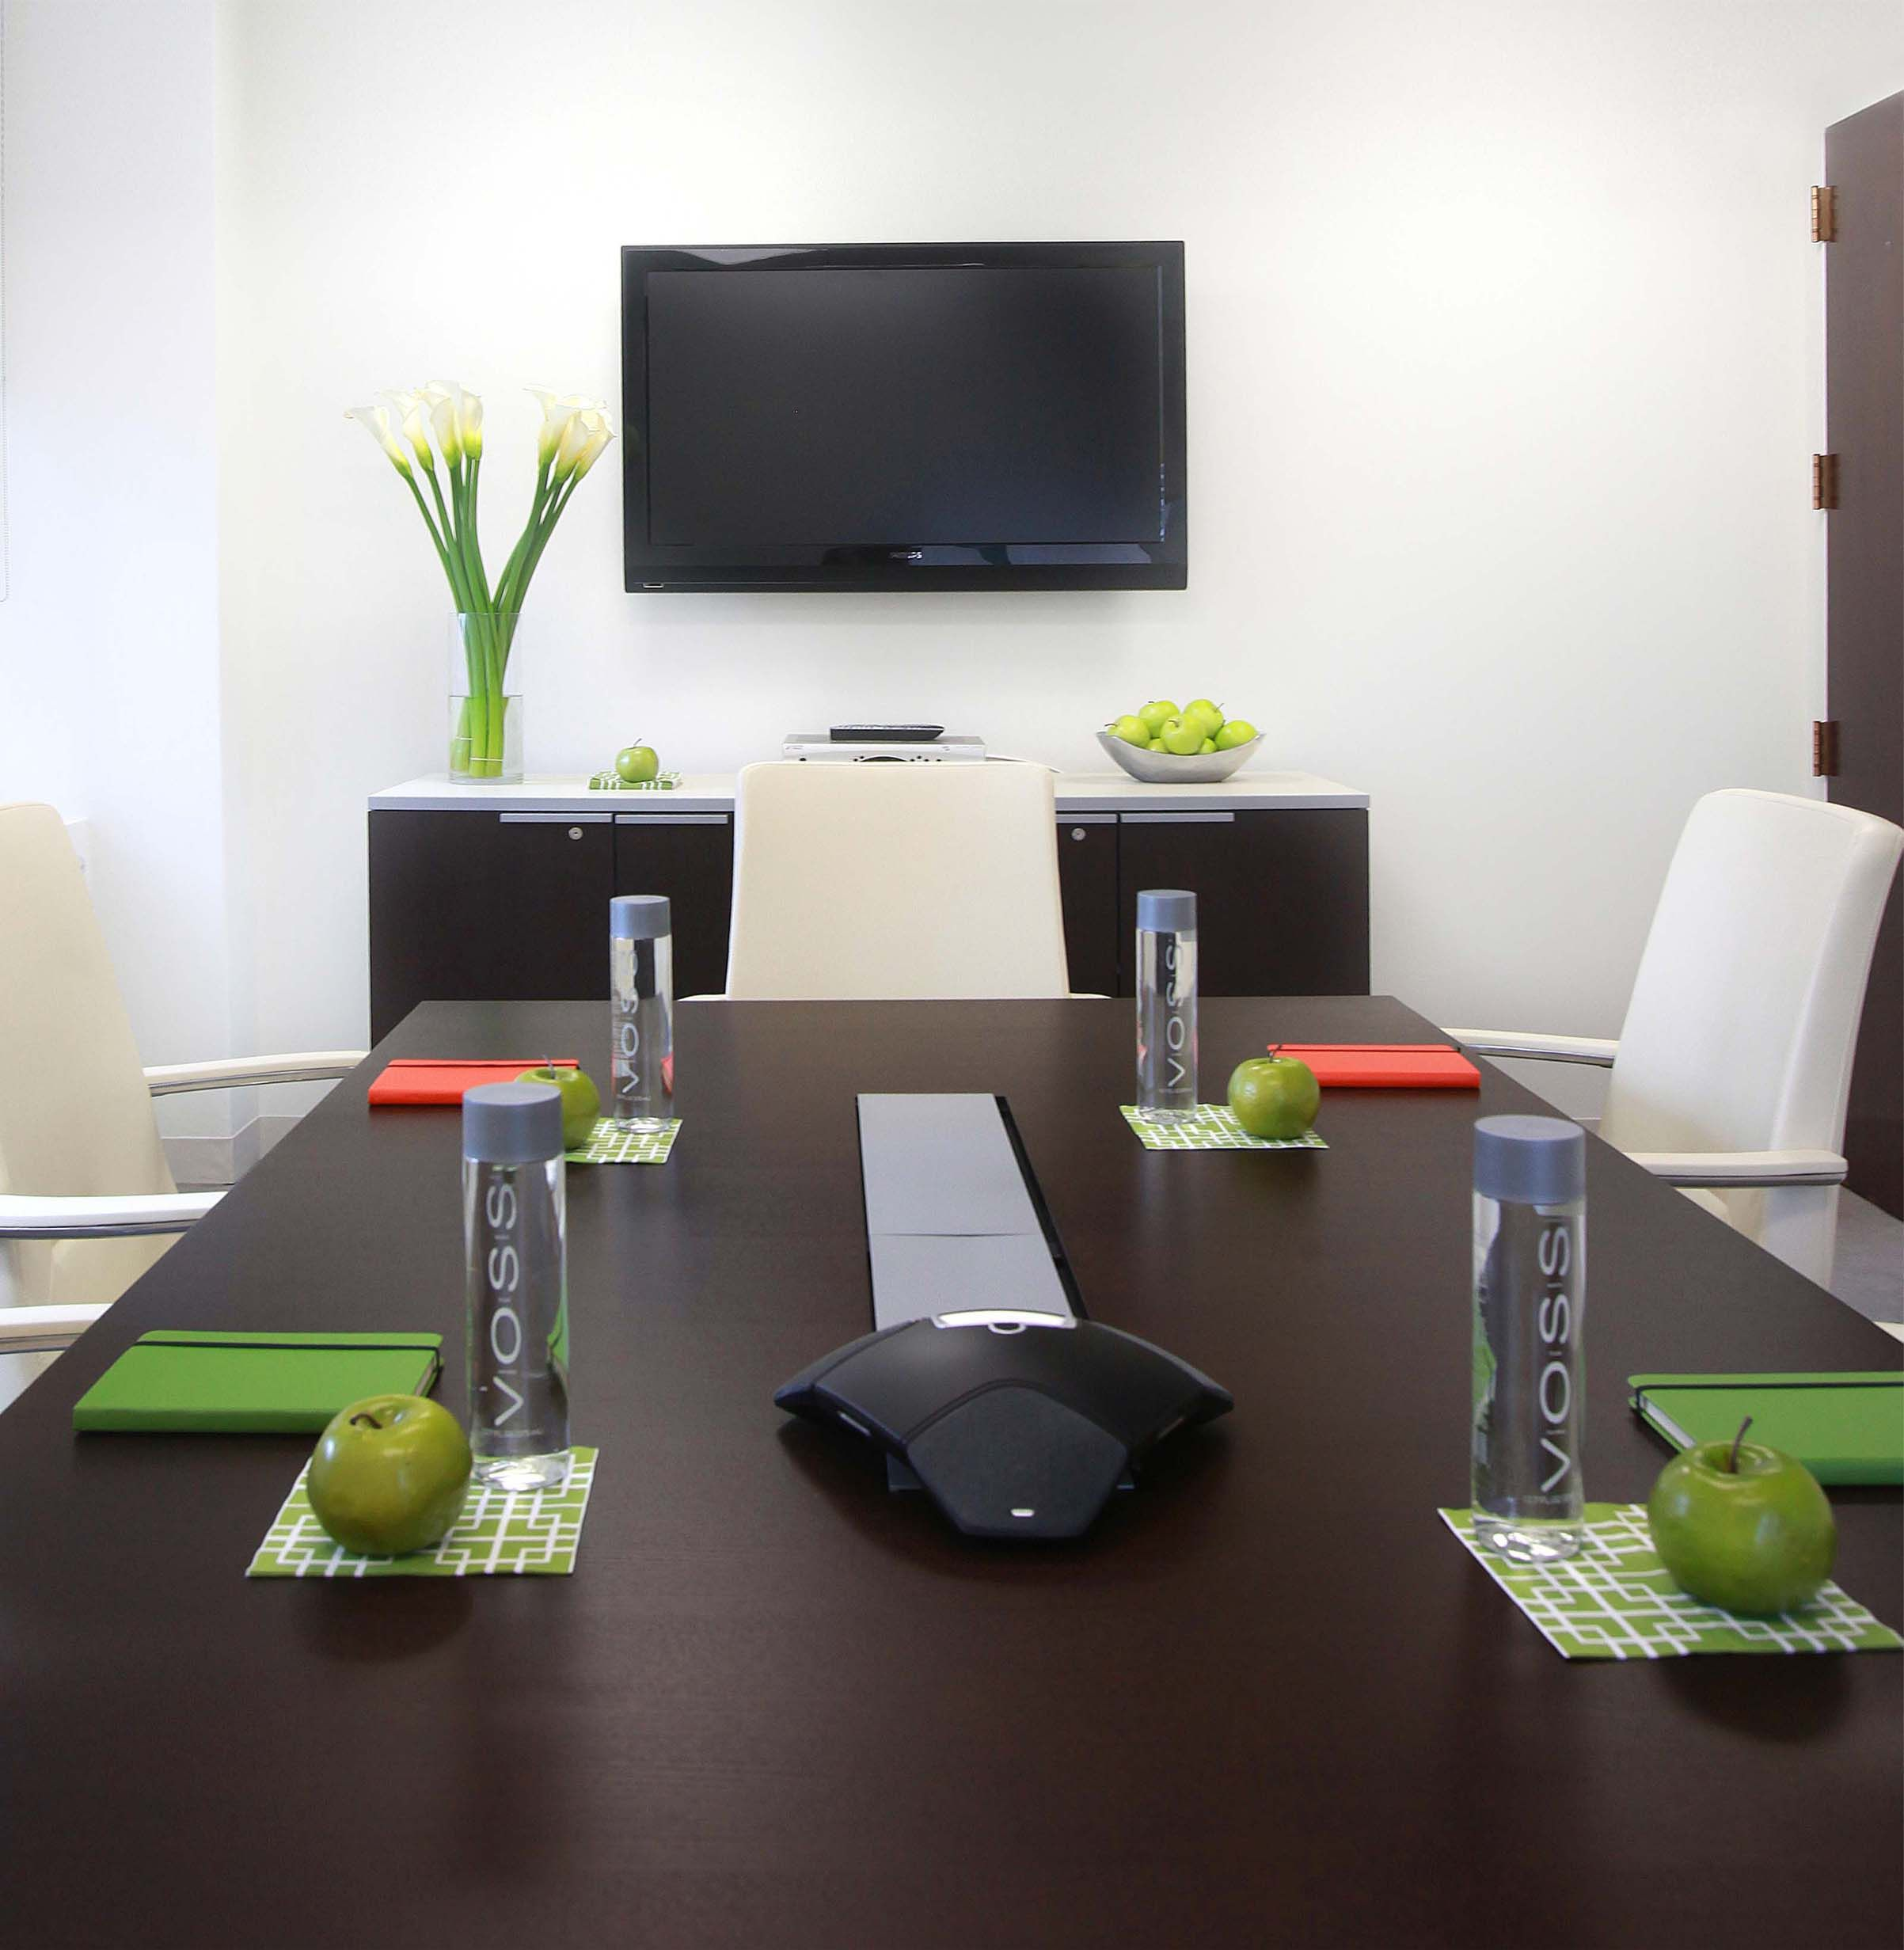 eco friendly corporate office design nyc eco friendly corporate office interior design conference room photo